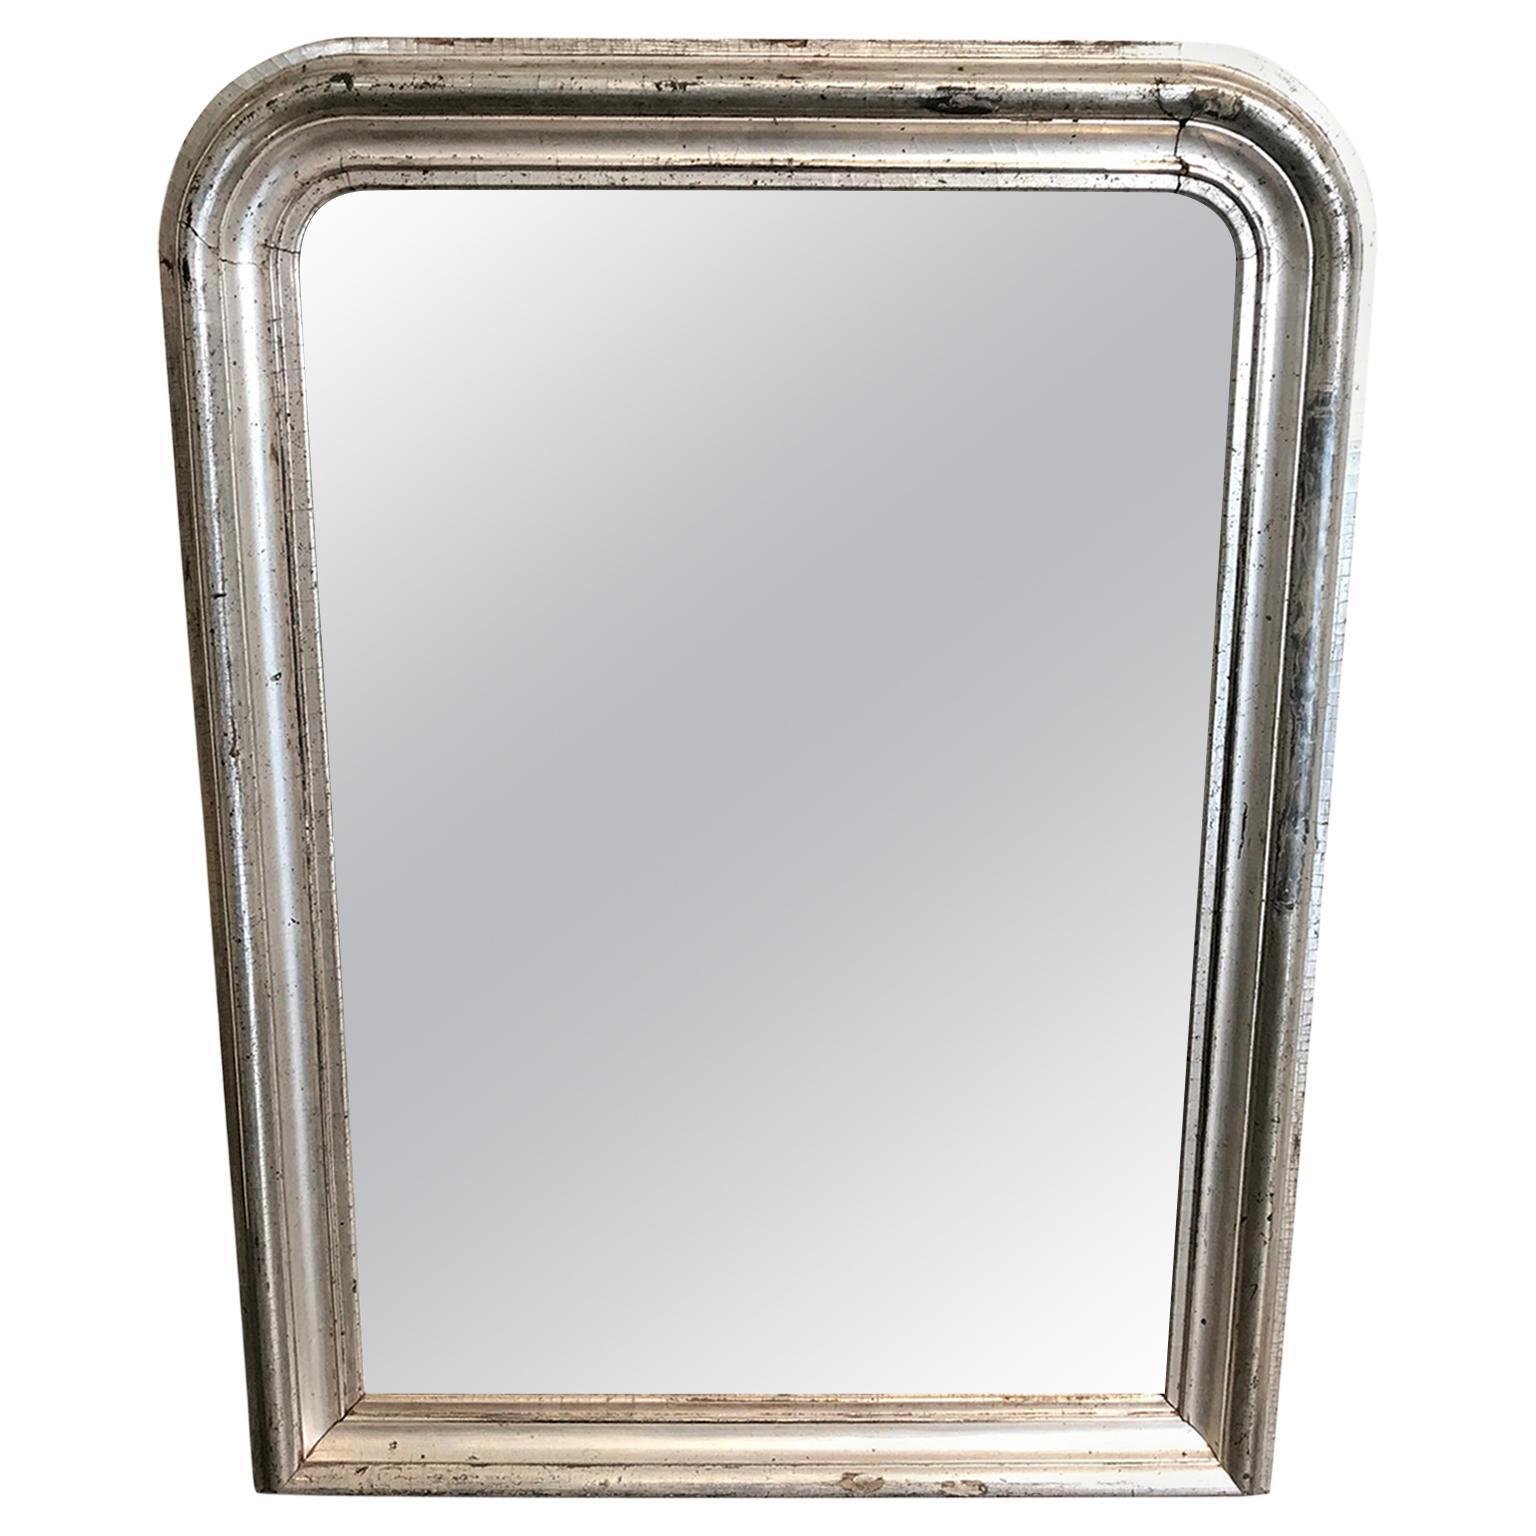 19th Century Silver Gilt Louis Philippe Mantel Wall Mirror